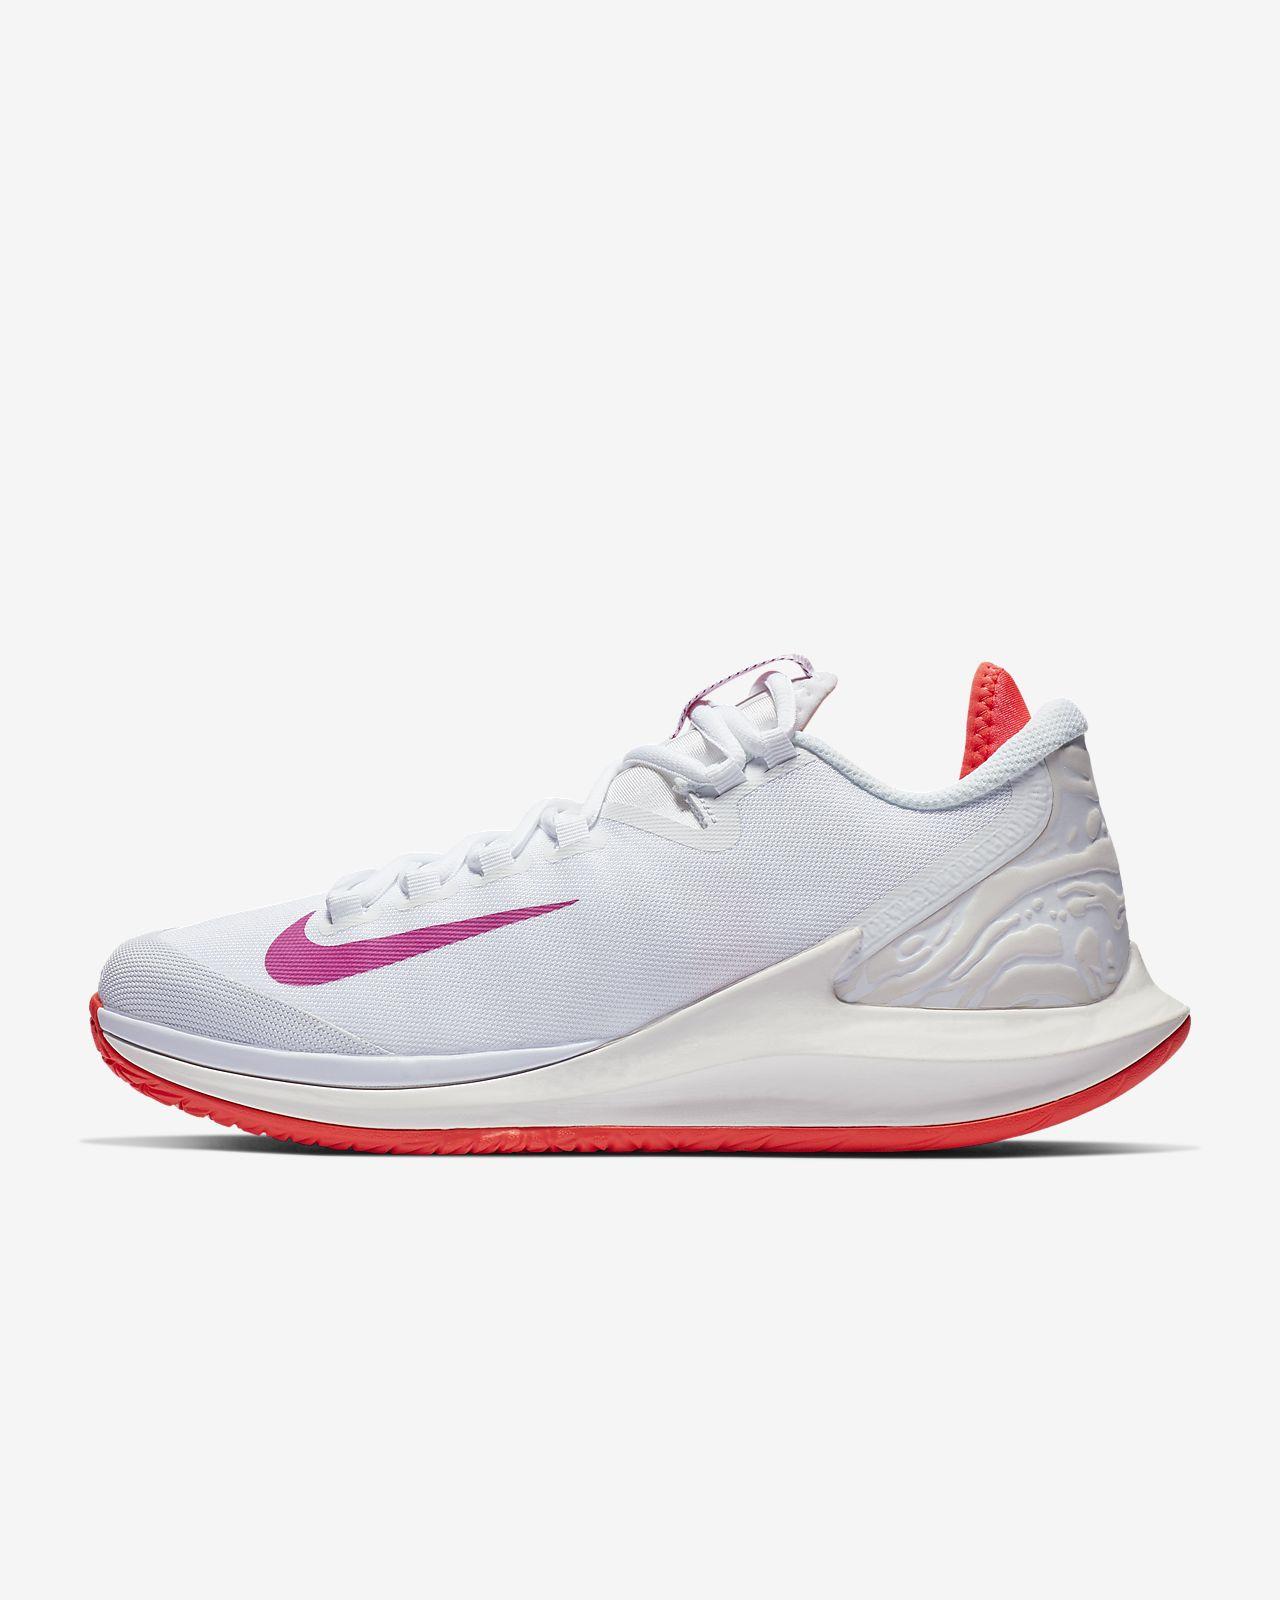 8b65fa989570 Chaussure de tennis NikeCourt Air Zoom Zero pour Femme. Nike.com BE